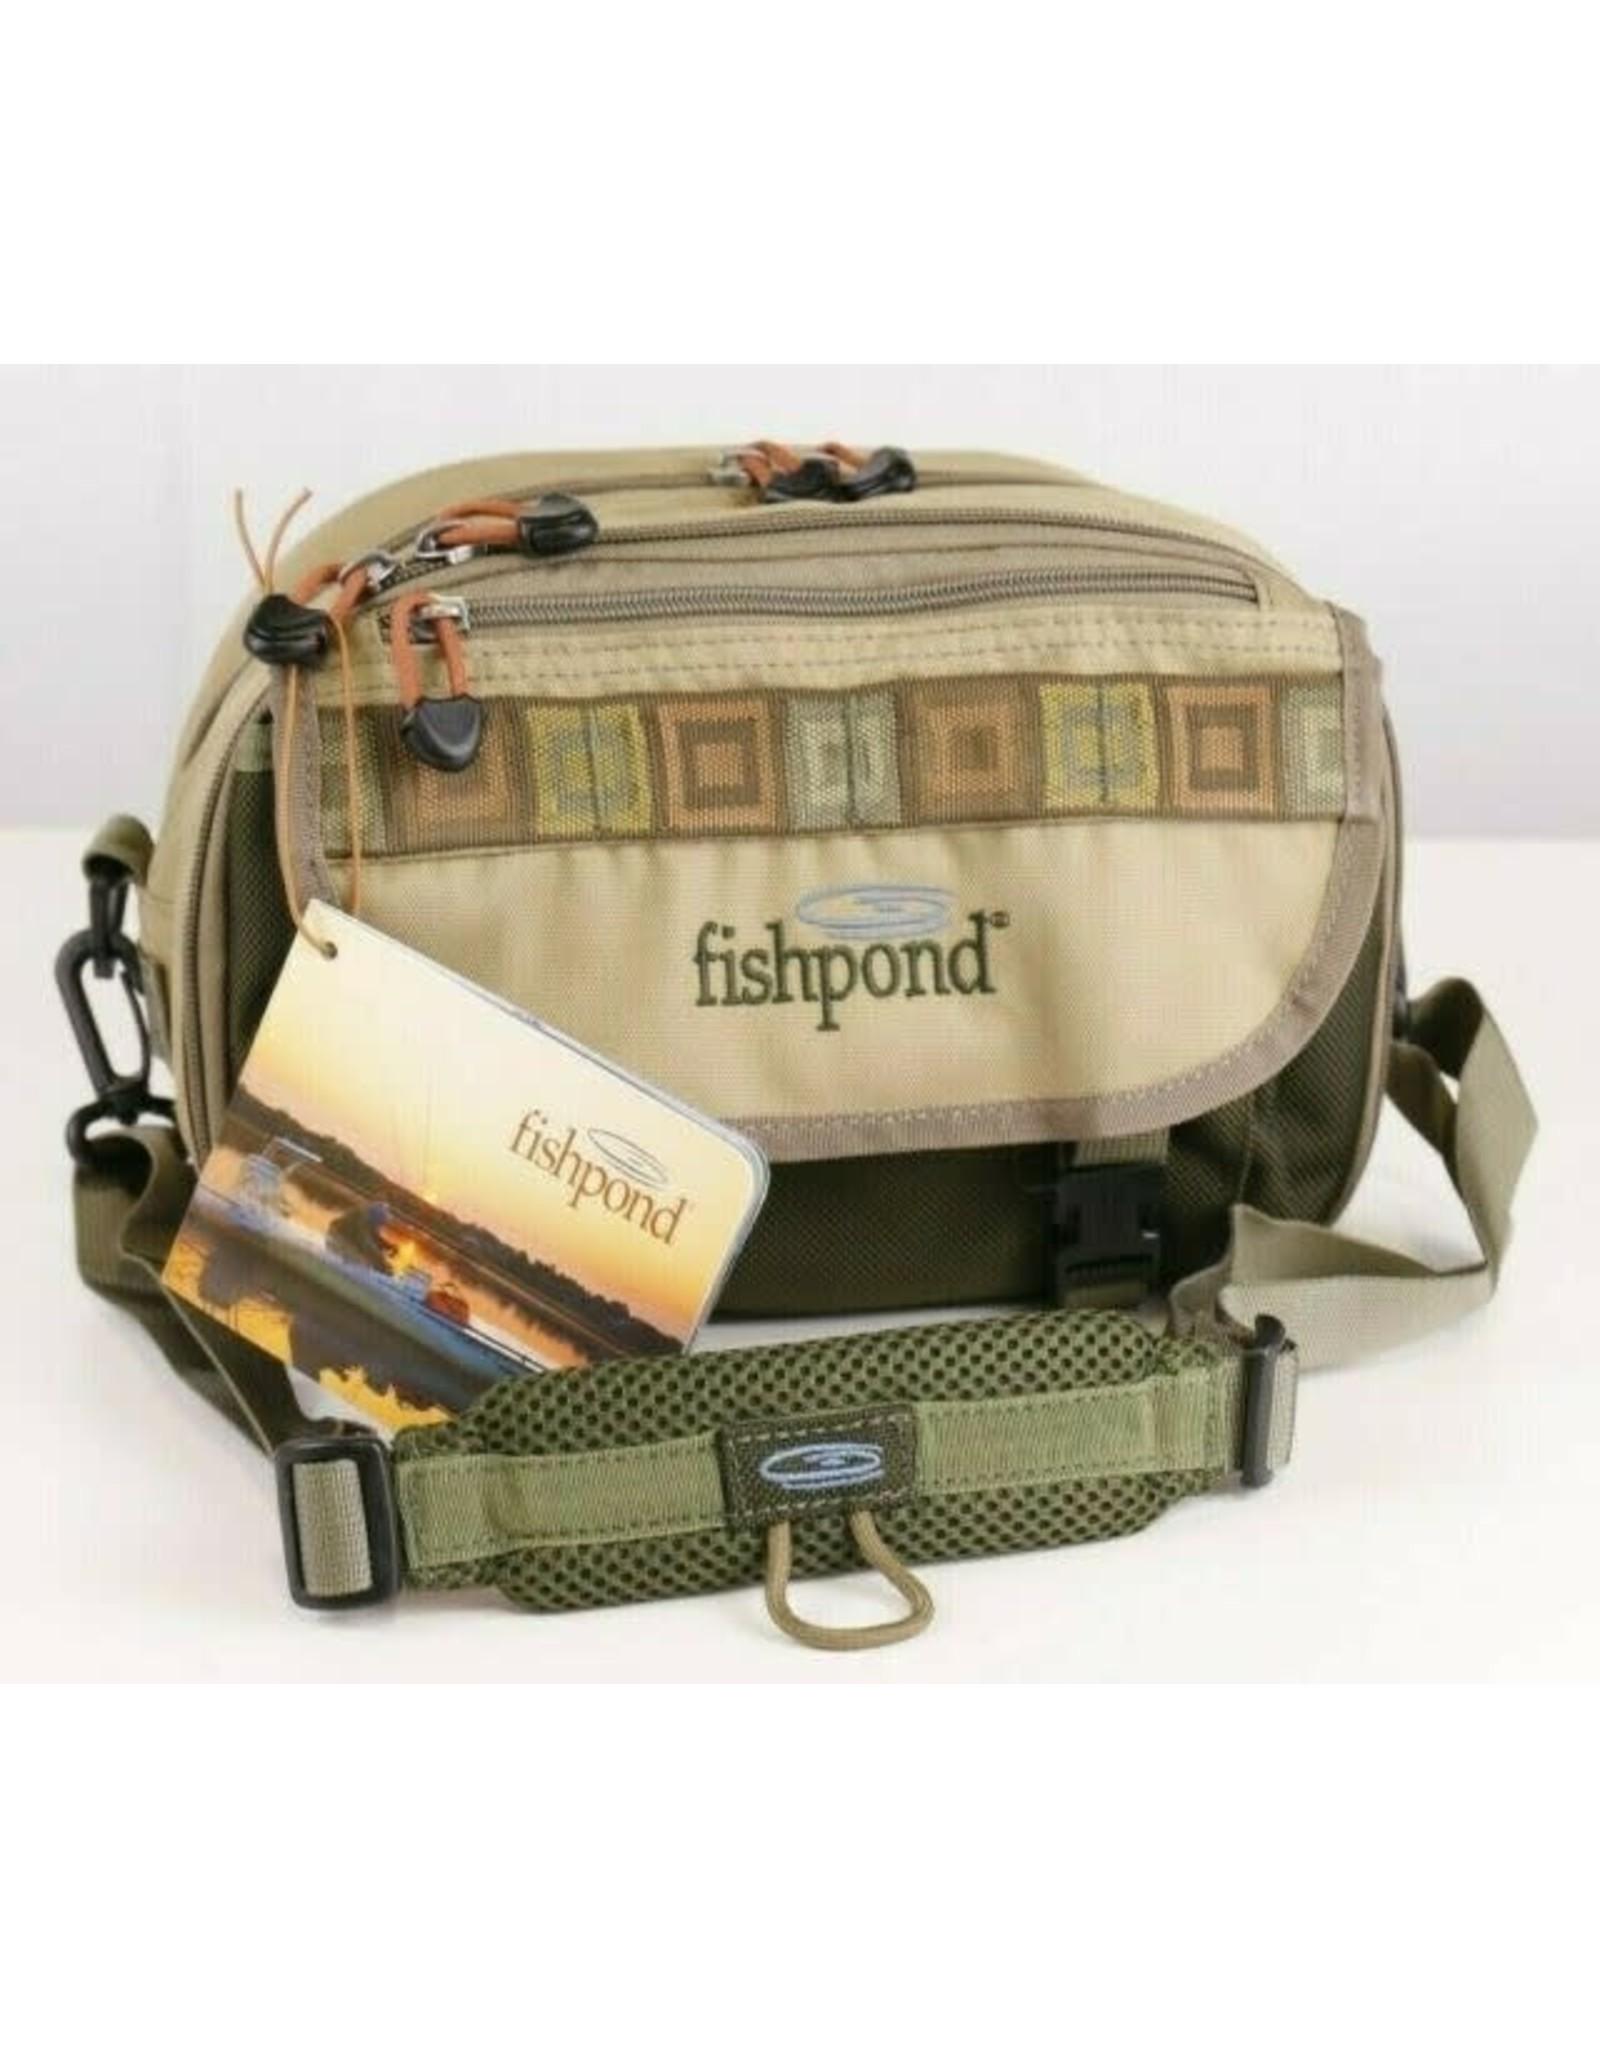 FISHPOND Fishpond Blue River Chest/Lumbar Pack